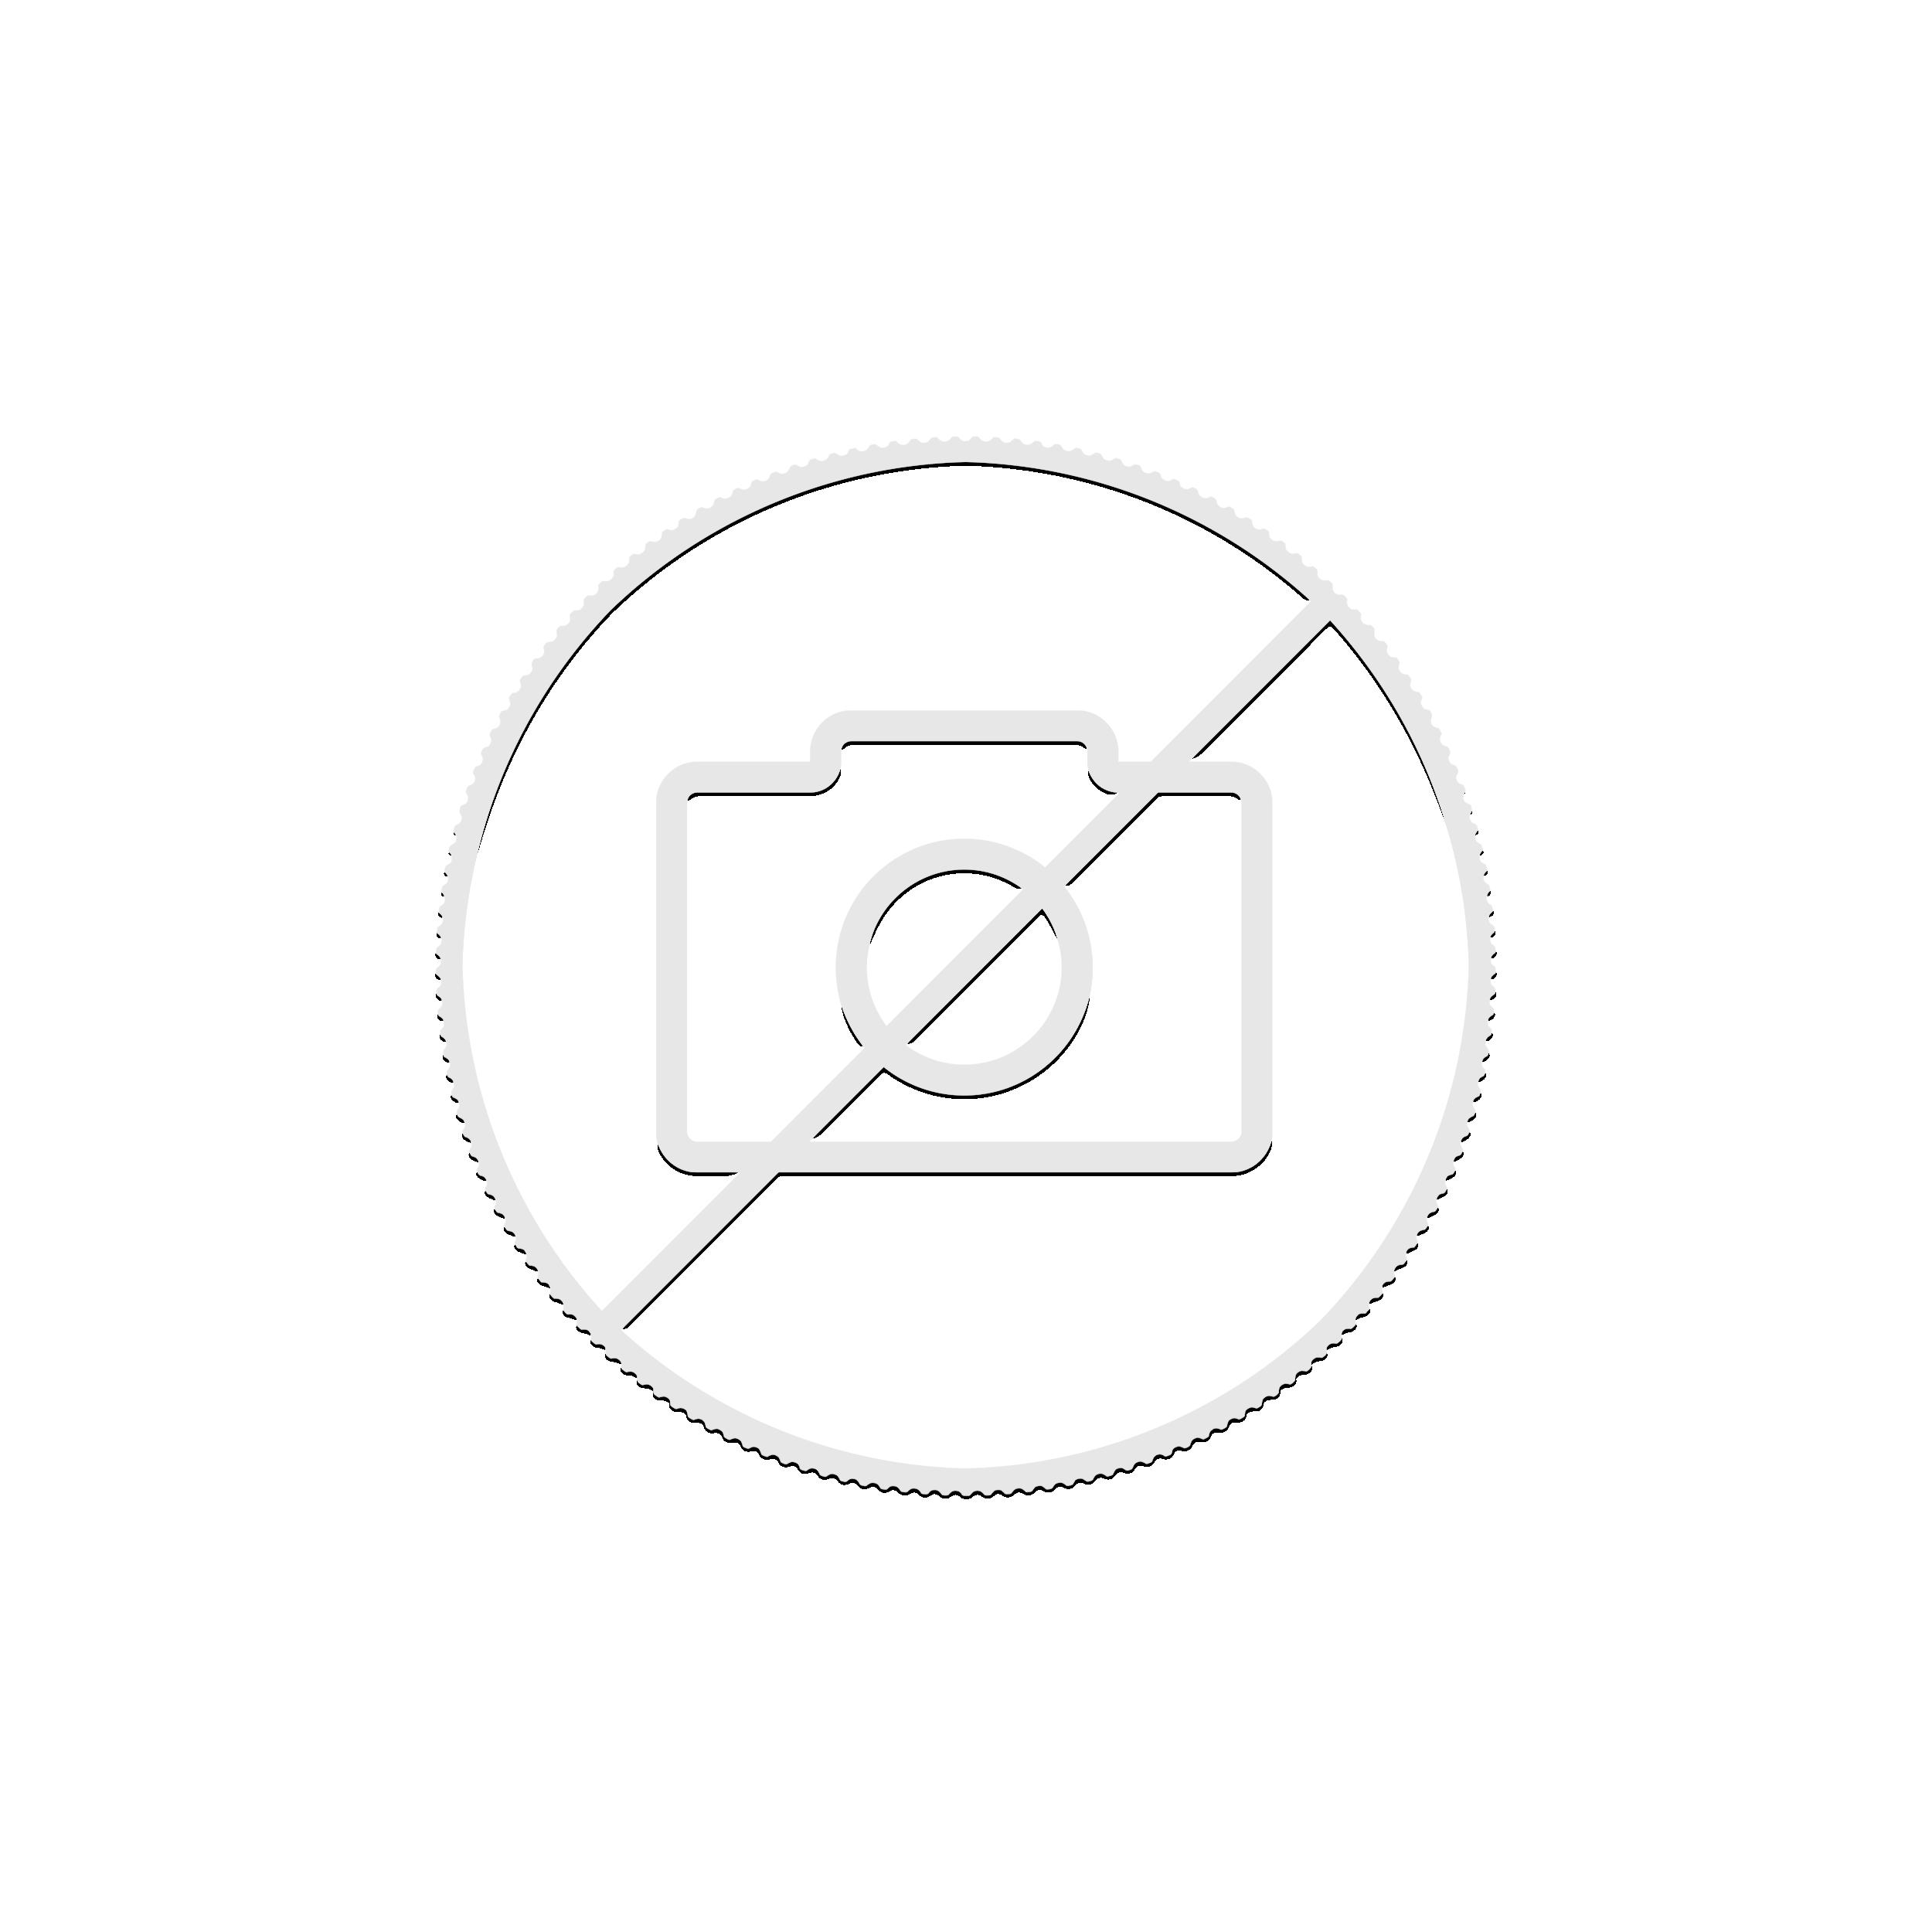 1 Troy ounce zilveren munt Krugerrand 2019 Proof in etui